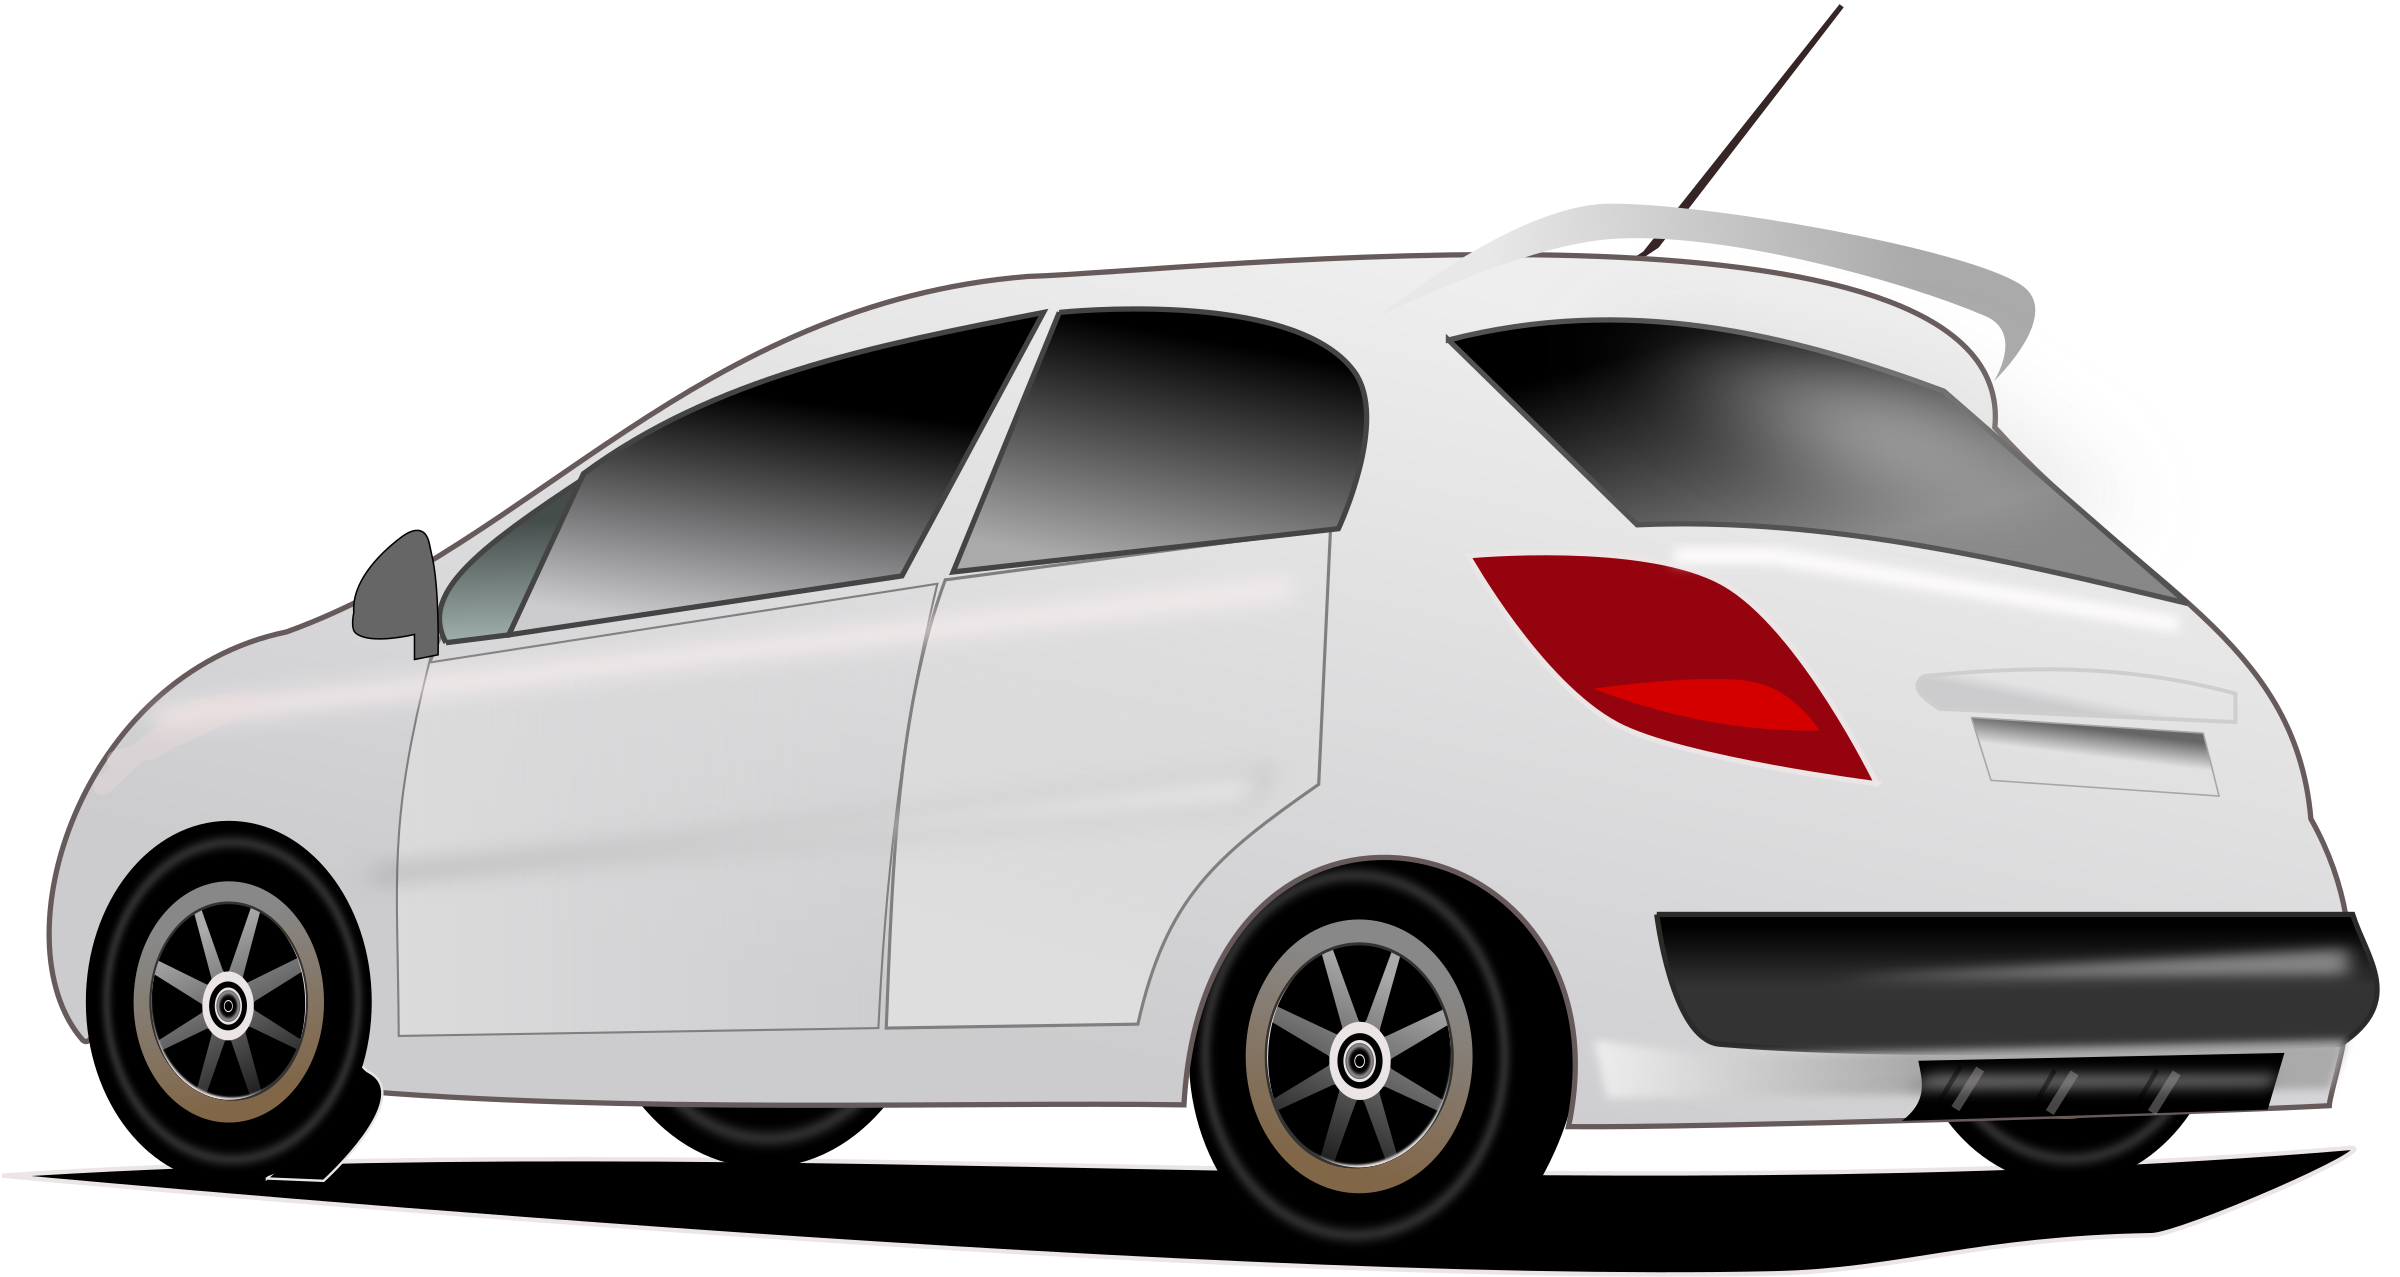 Car driving down road clipart vector stock Clipart - rally-car vector stock